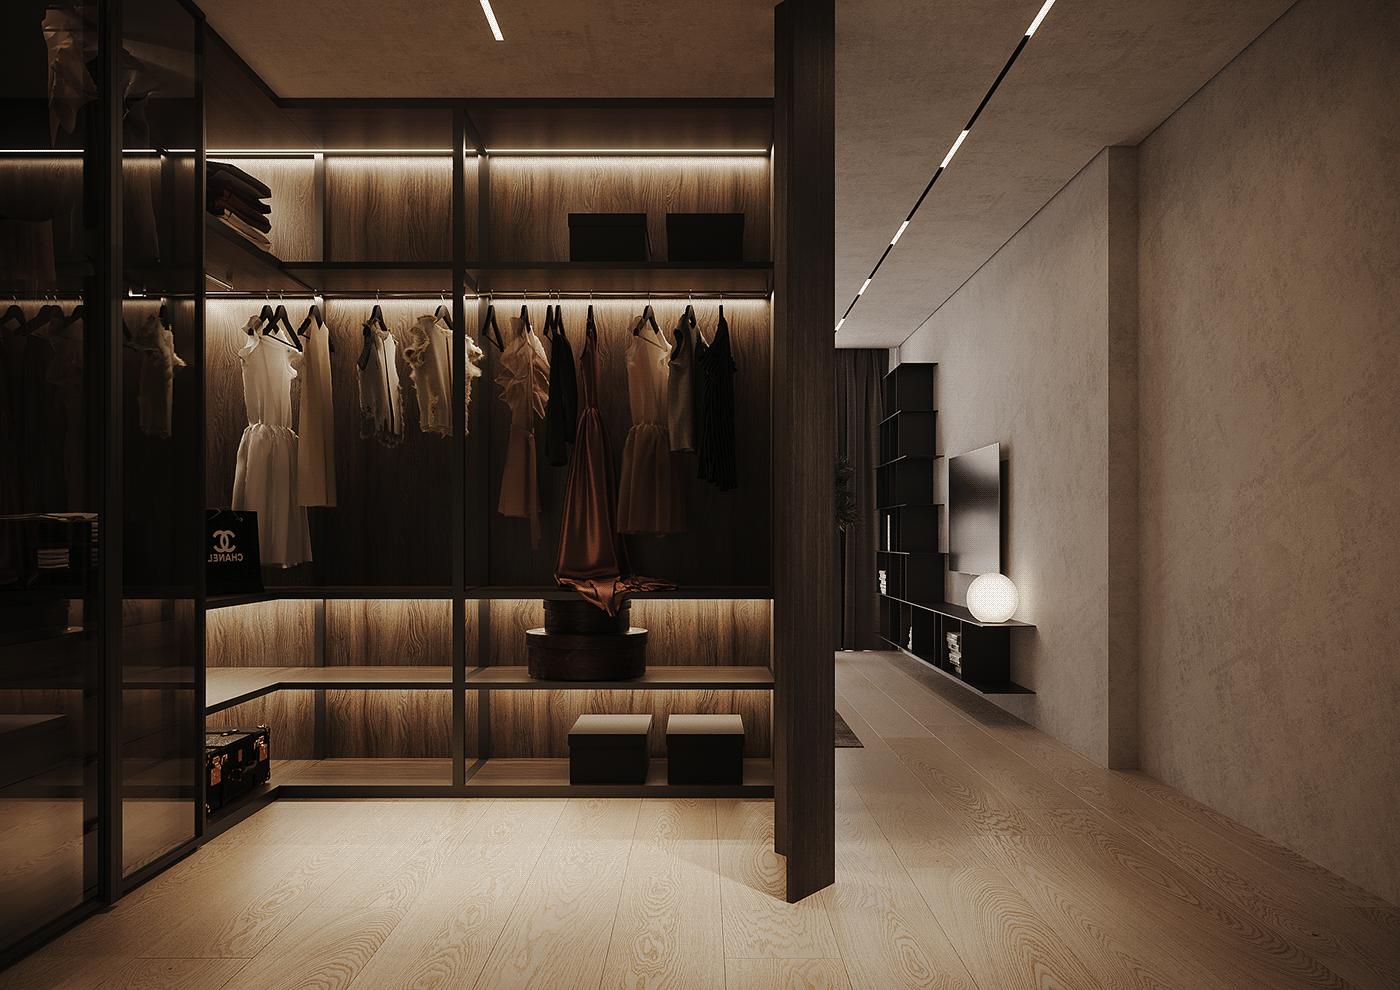 3D Visualization design design interior Interior interior design  Interior Visualization Render visualization visualization interior